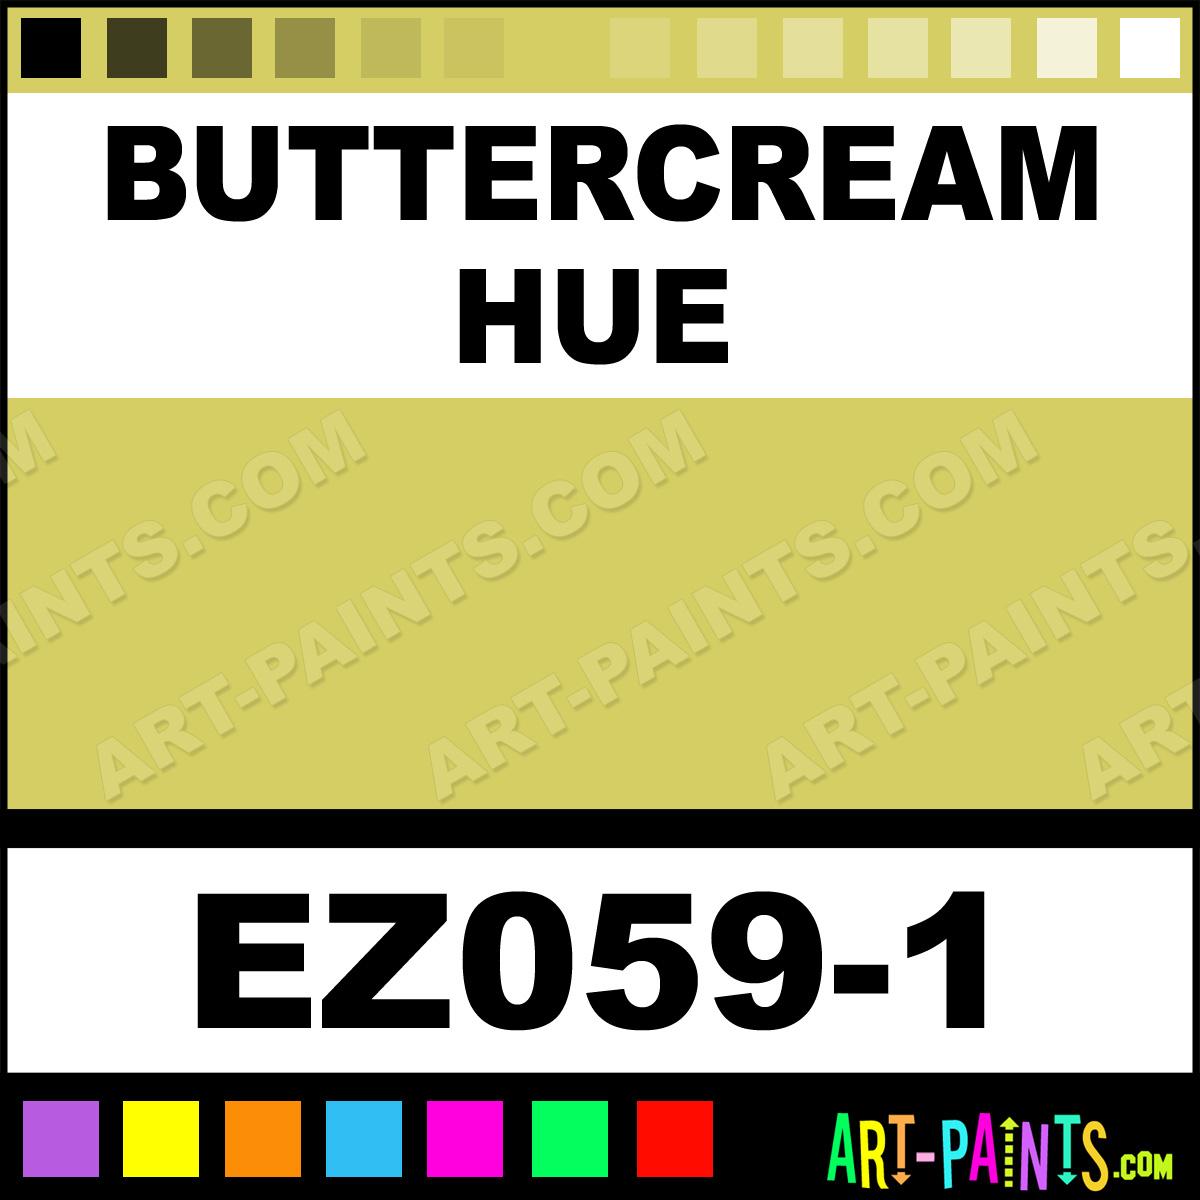 Can You Spray Paint Buttercream